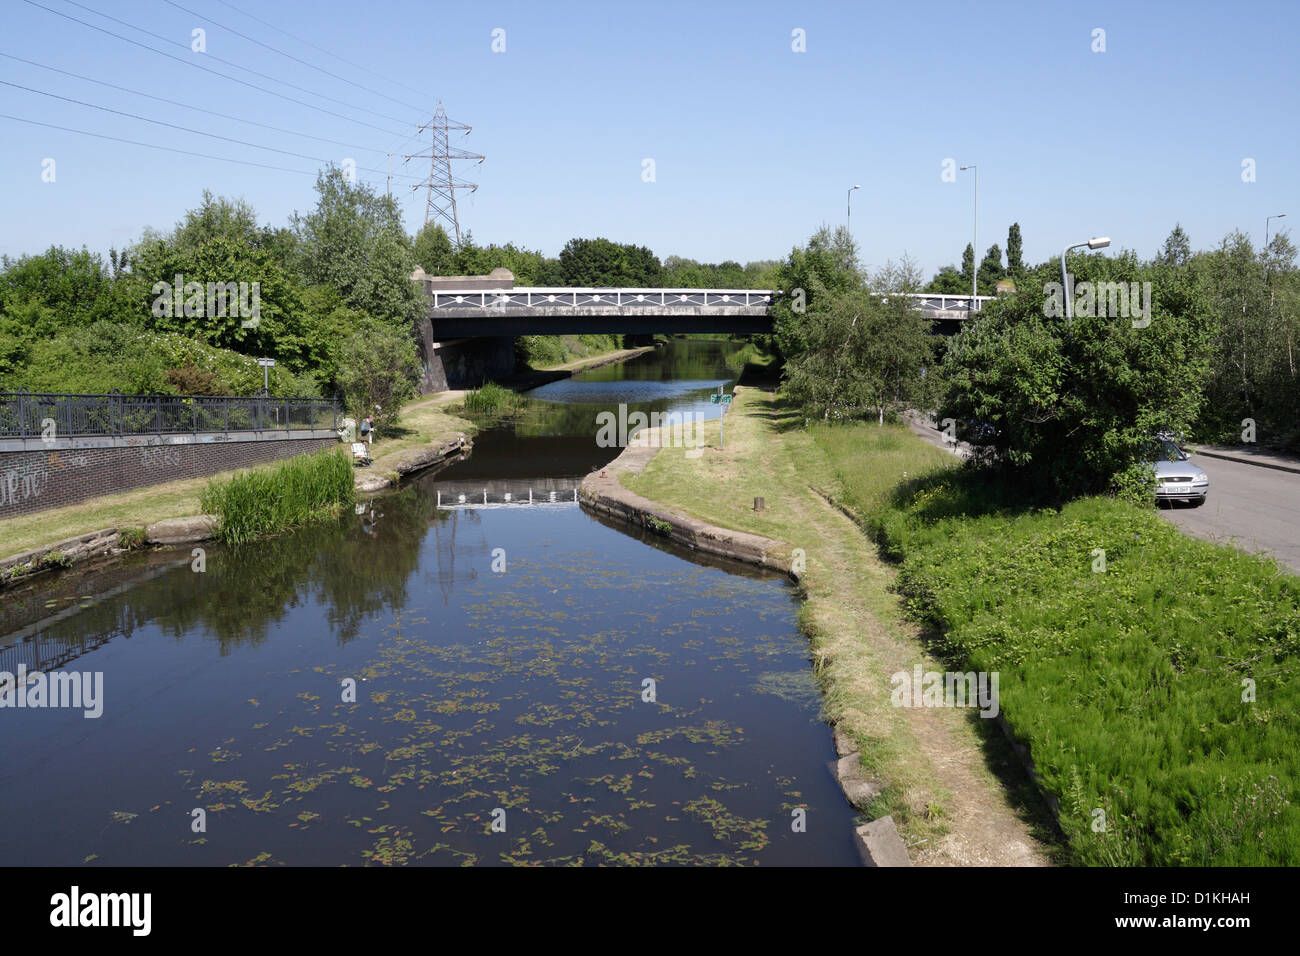 The Sheffield and Tinsley canal near Broughton lane bridge - Stock Image